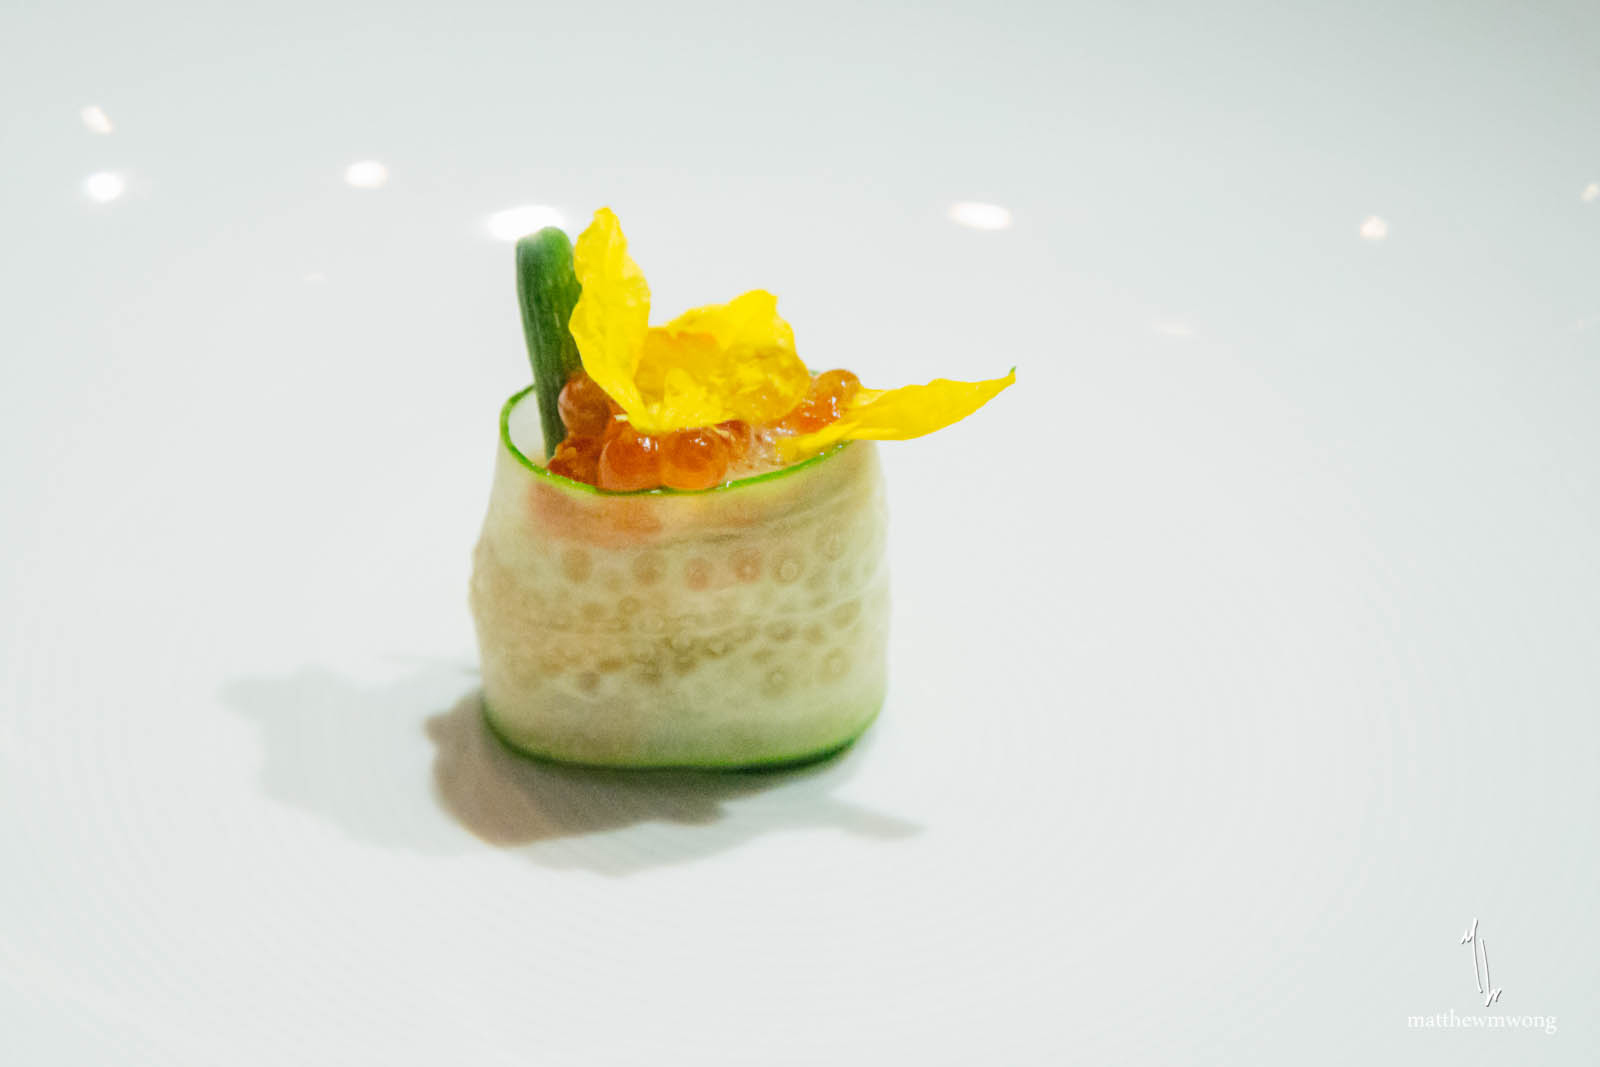 Tasmanian Ocean Trout - smoked ikura, wasabi, vinaigrette